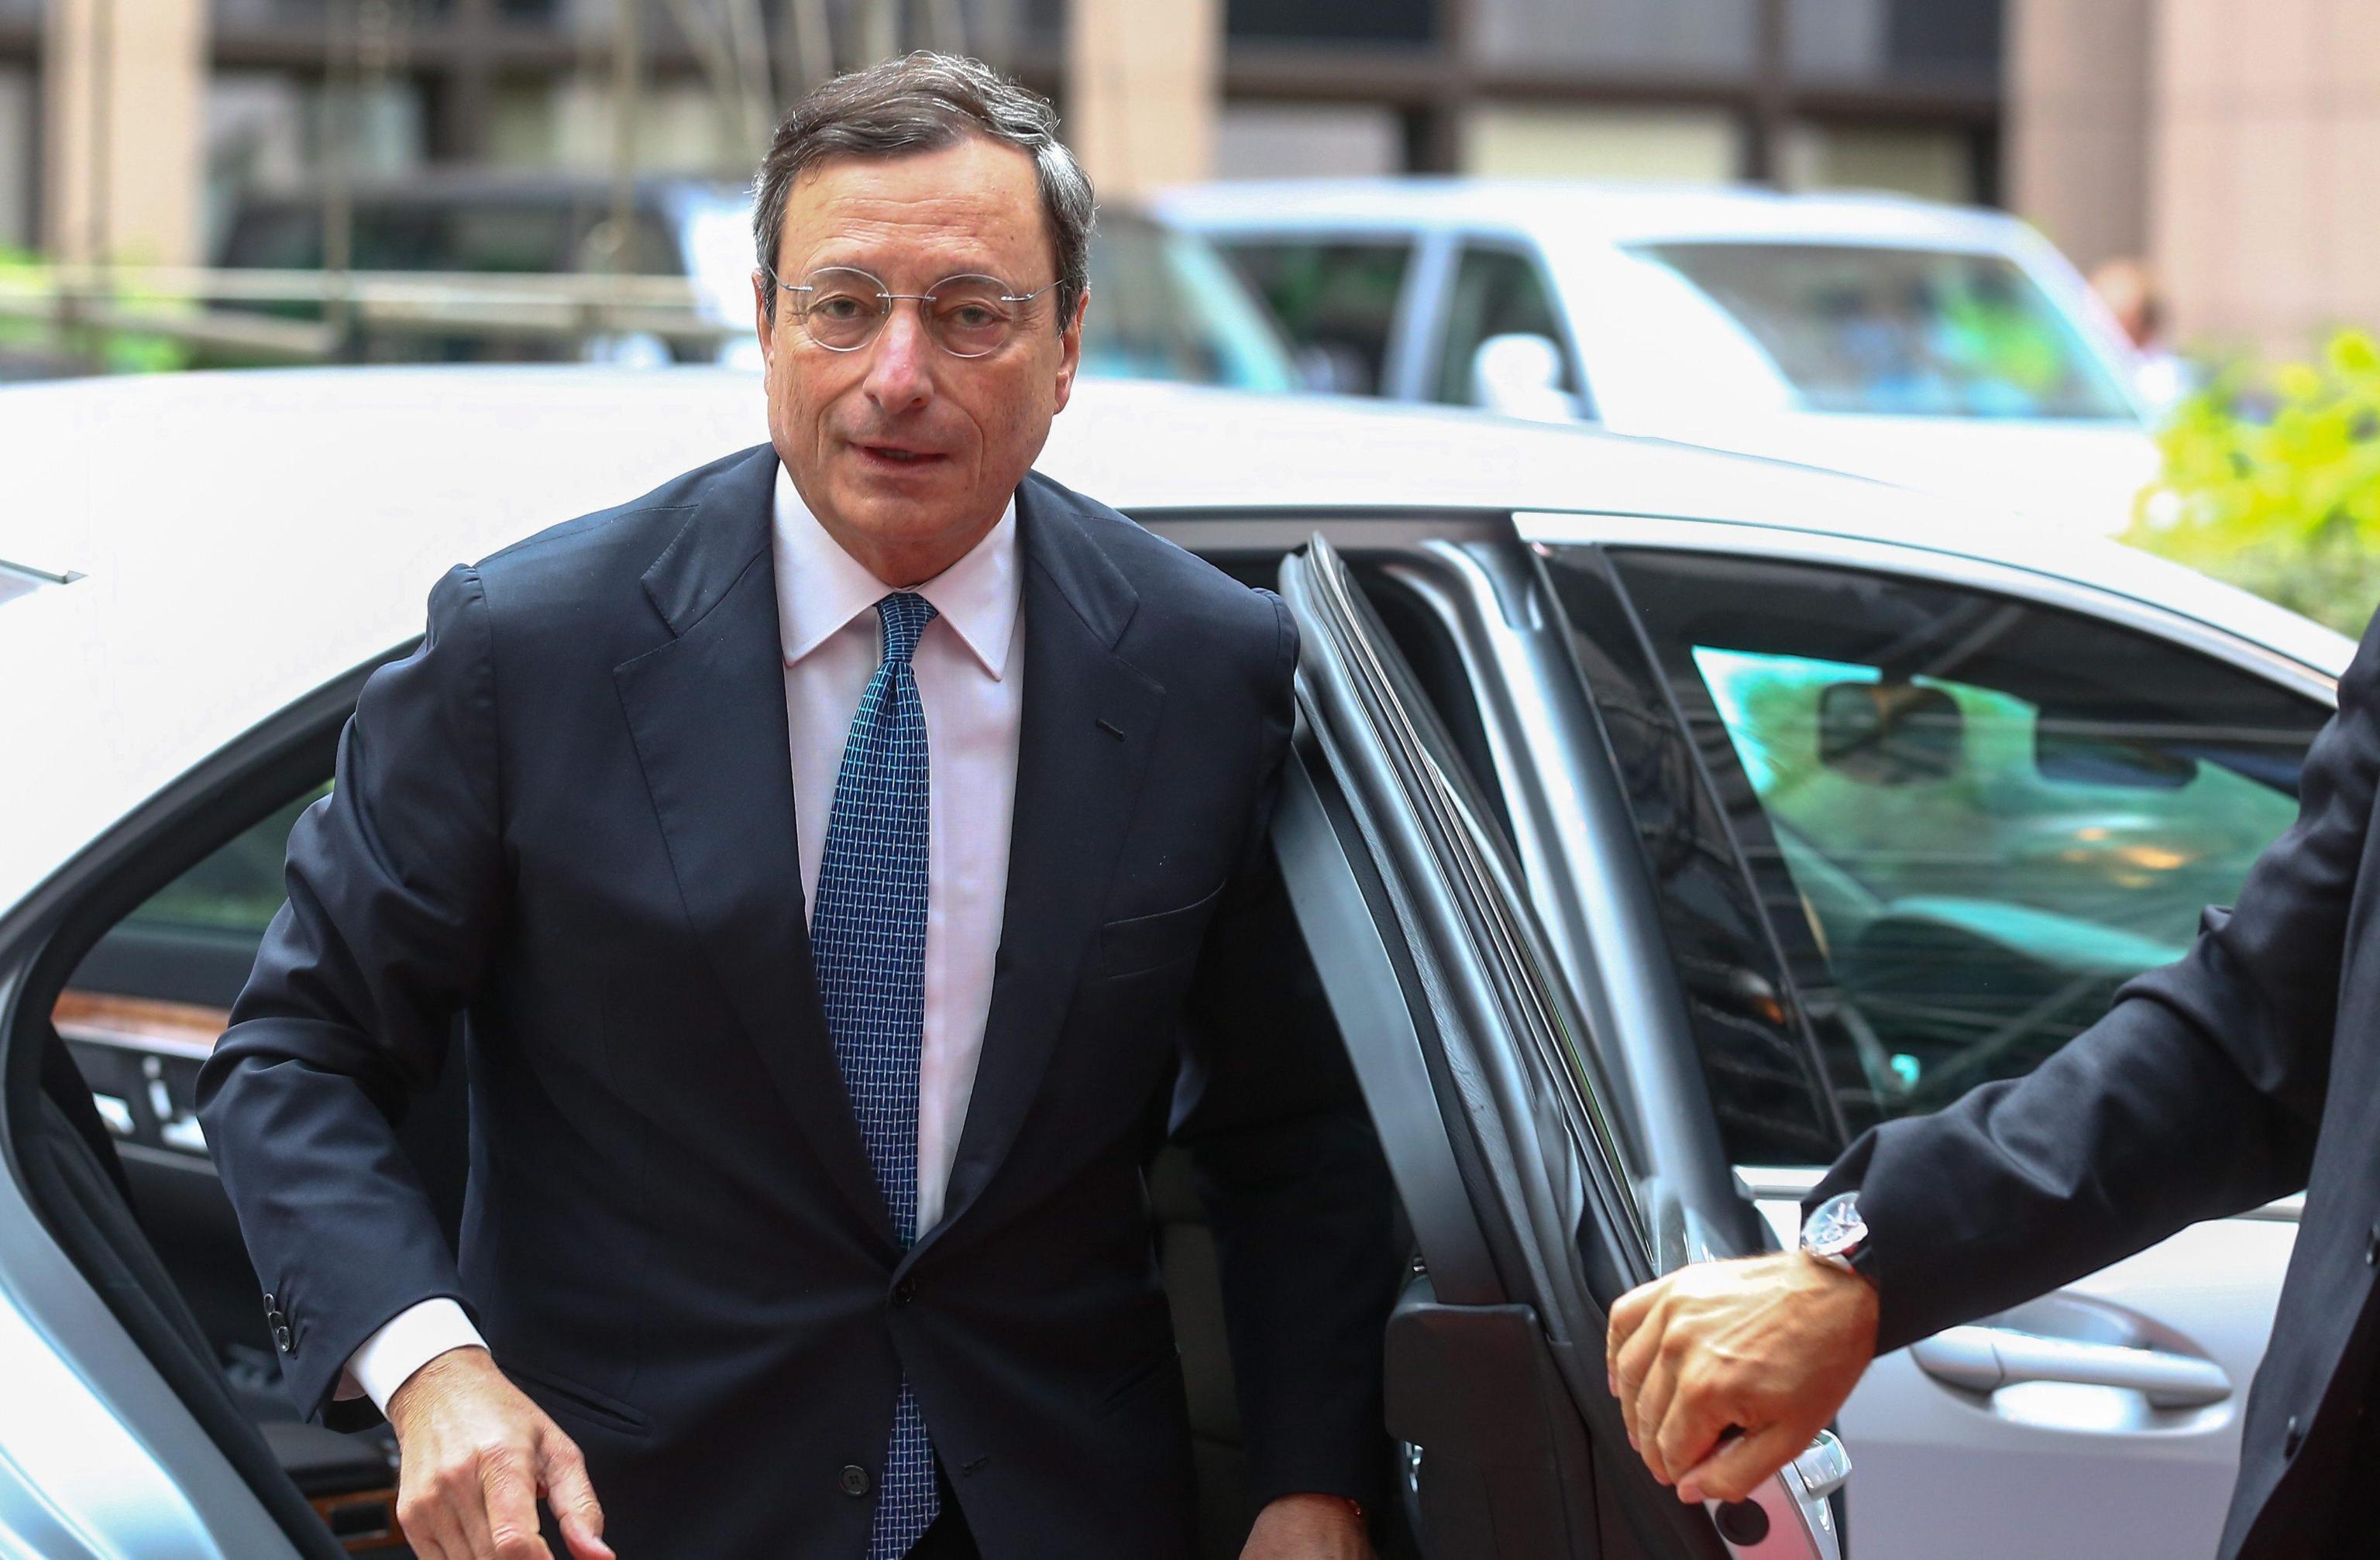 ++ CRISI: BCE DRAGHI ANNULLA VIAGGIO A JACKSON HOLE ++